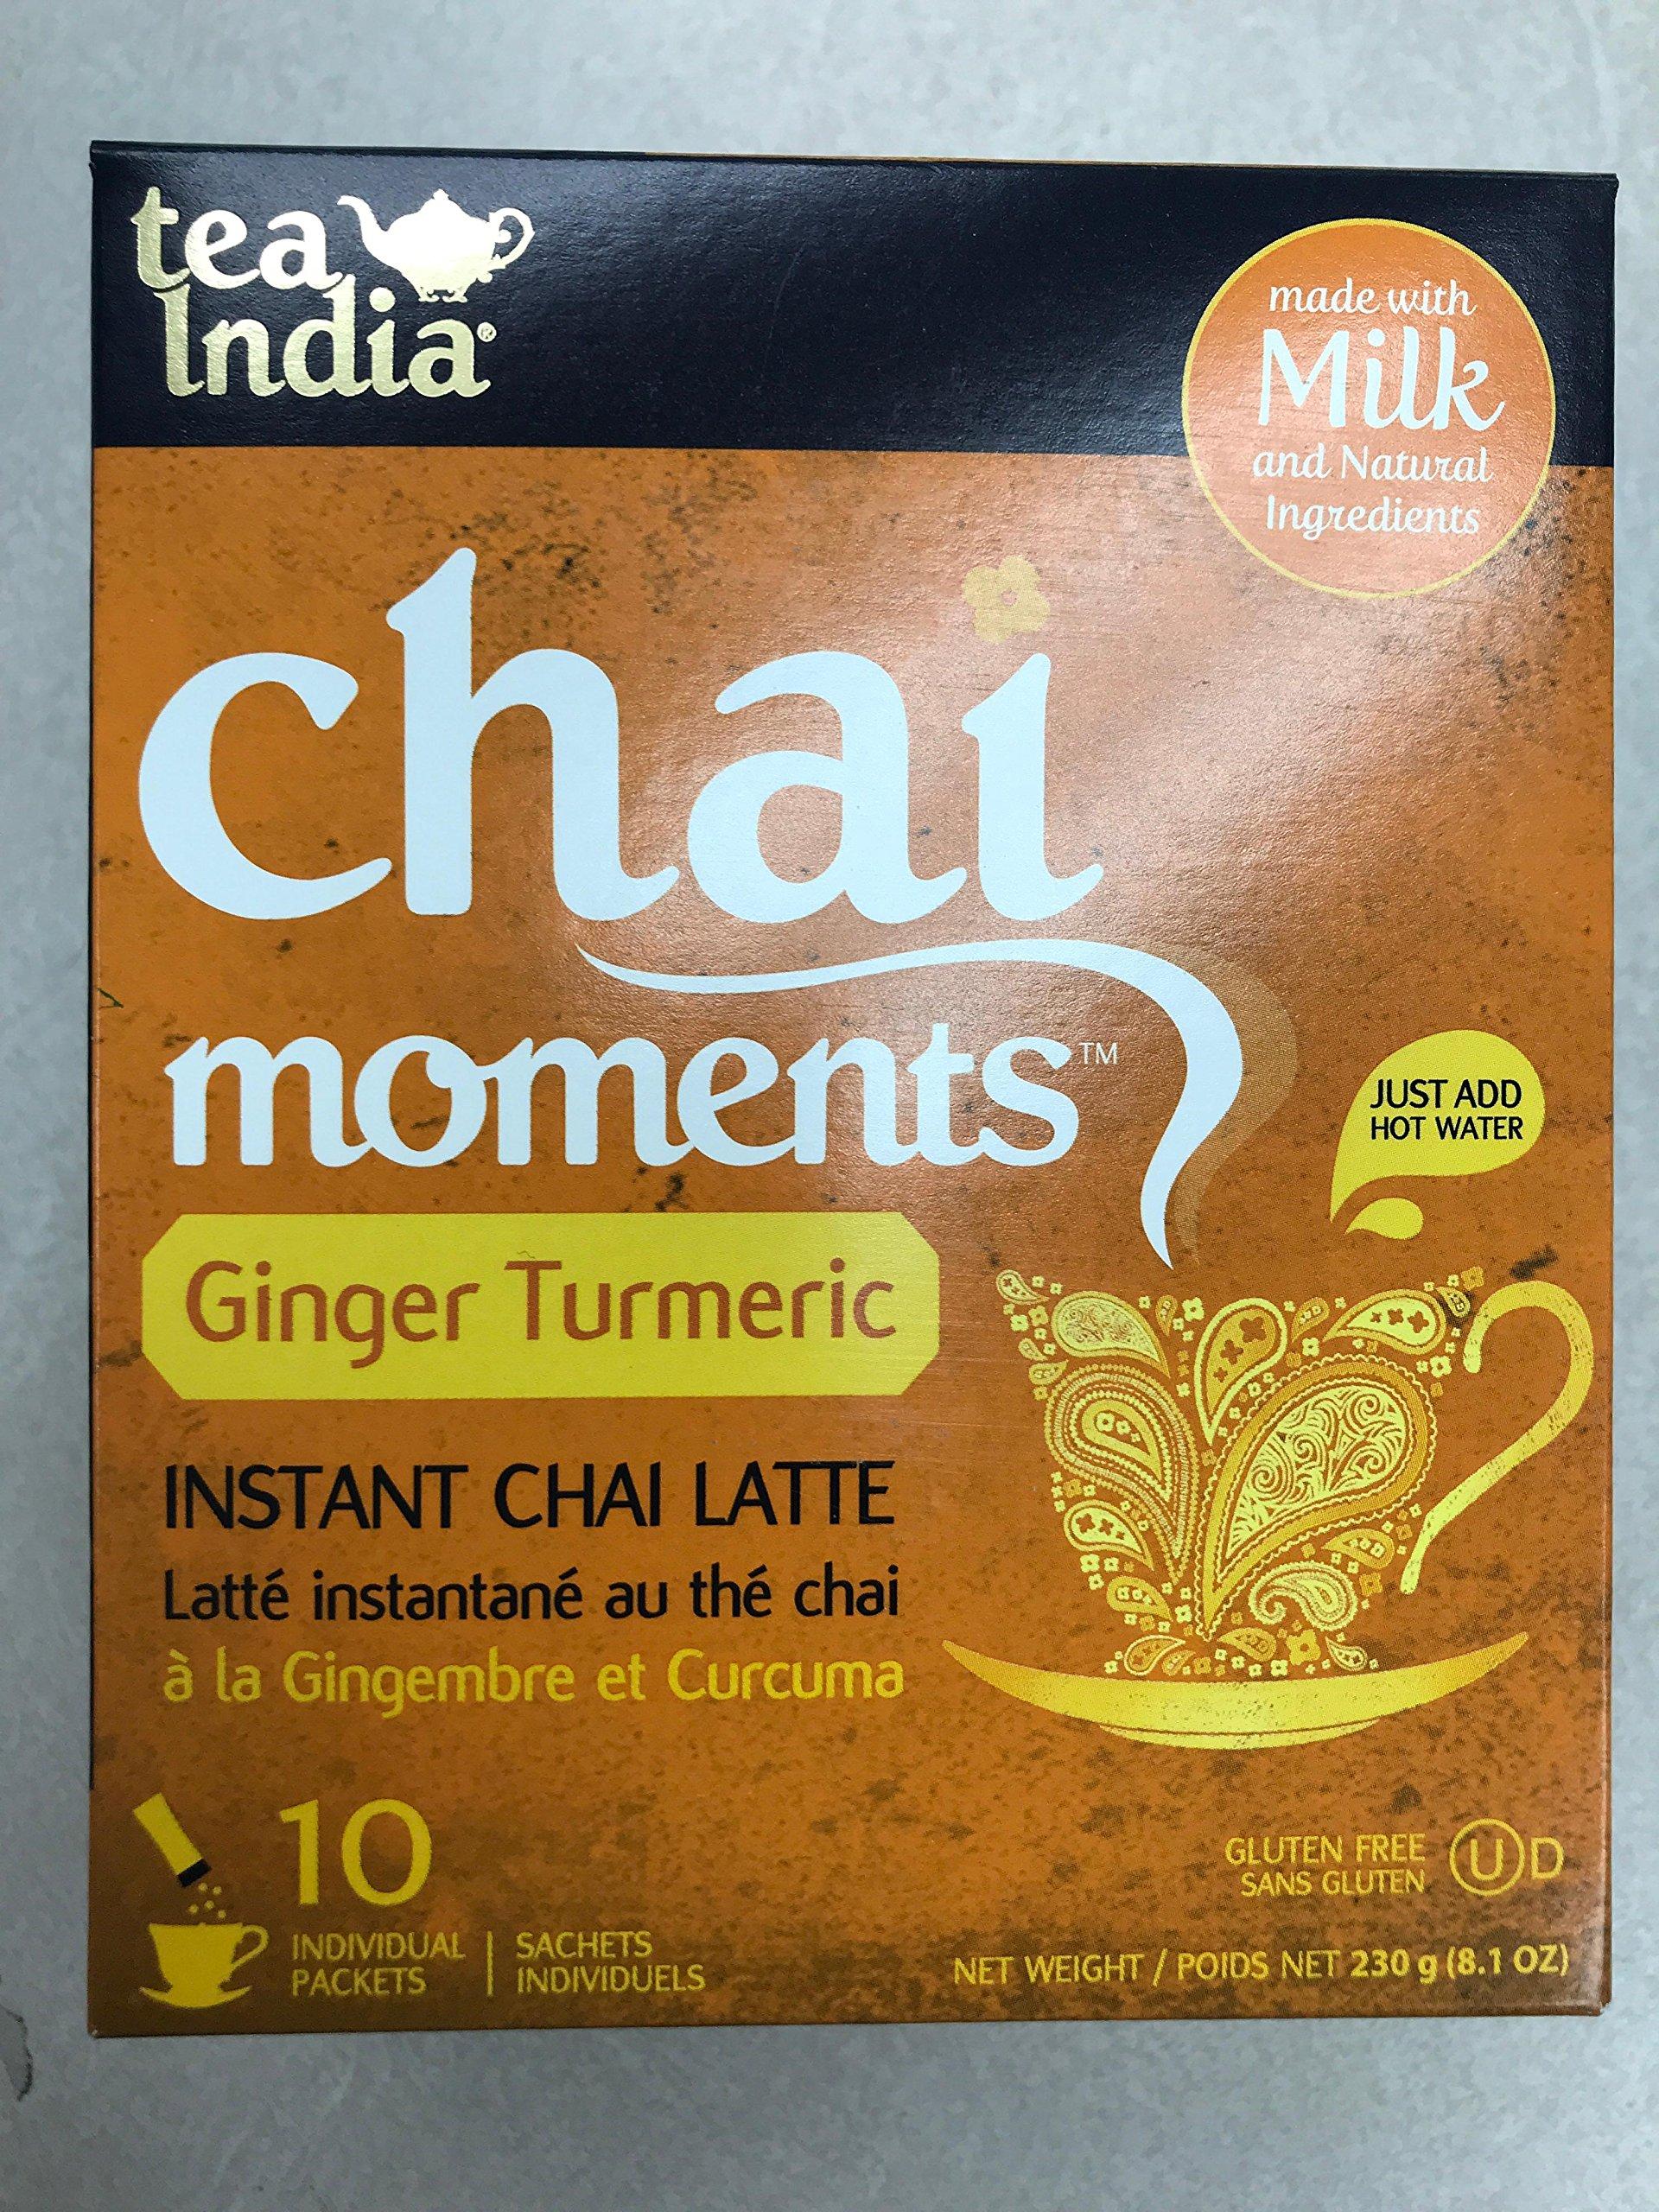 Tea India Chai Moments Instant Chai Latte Ginger Turmeric 10 Sachets (230 g / 8.1 oz)